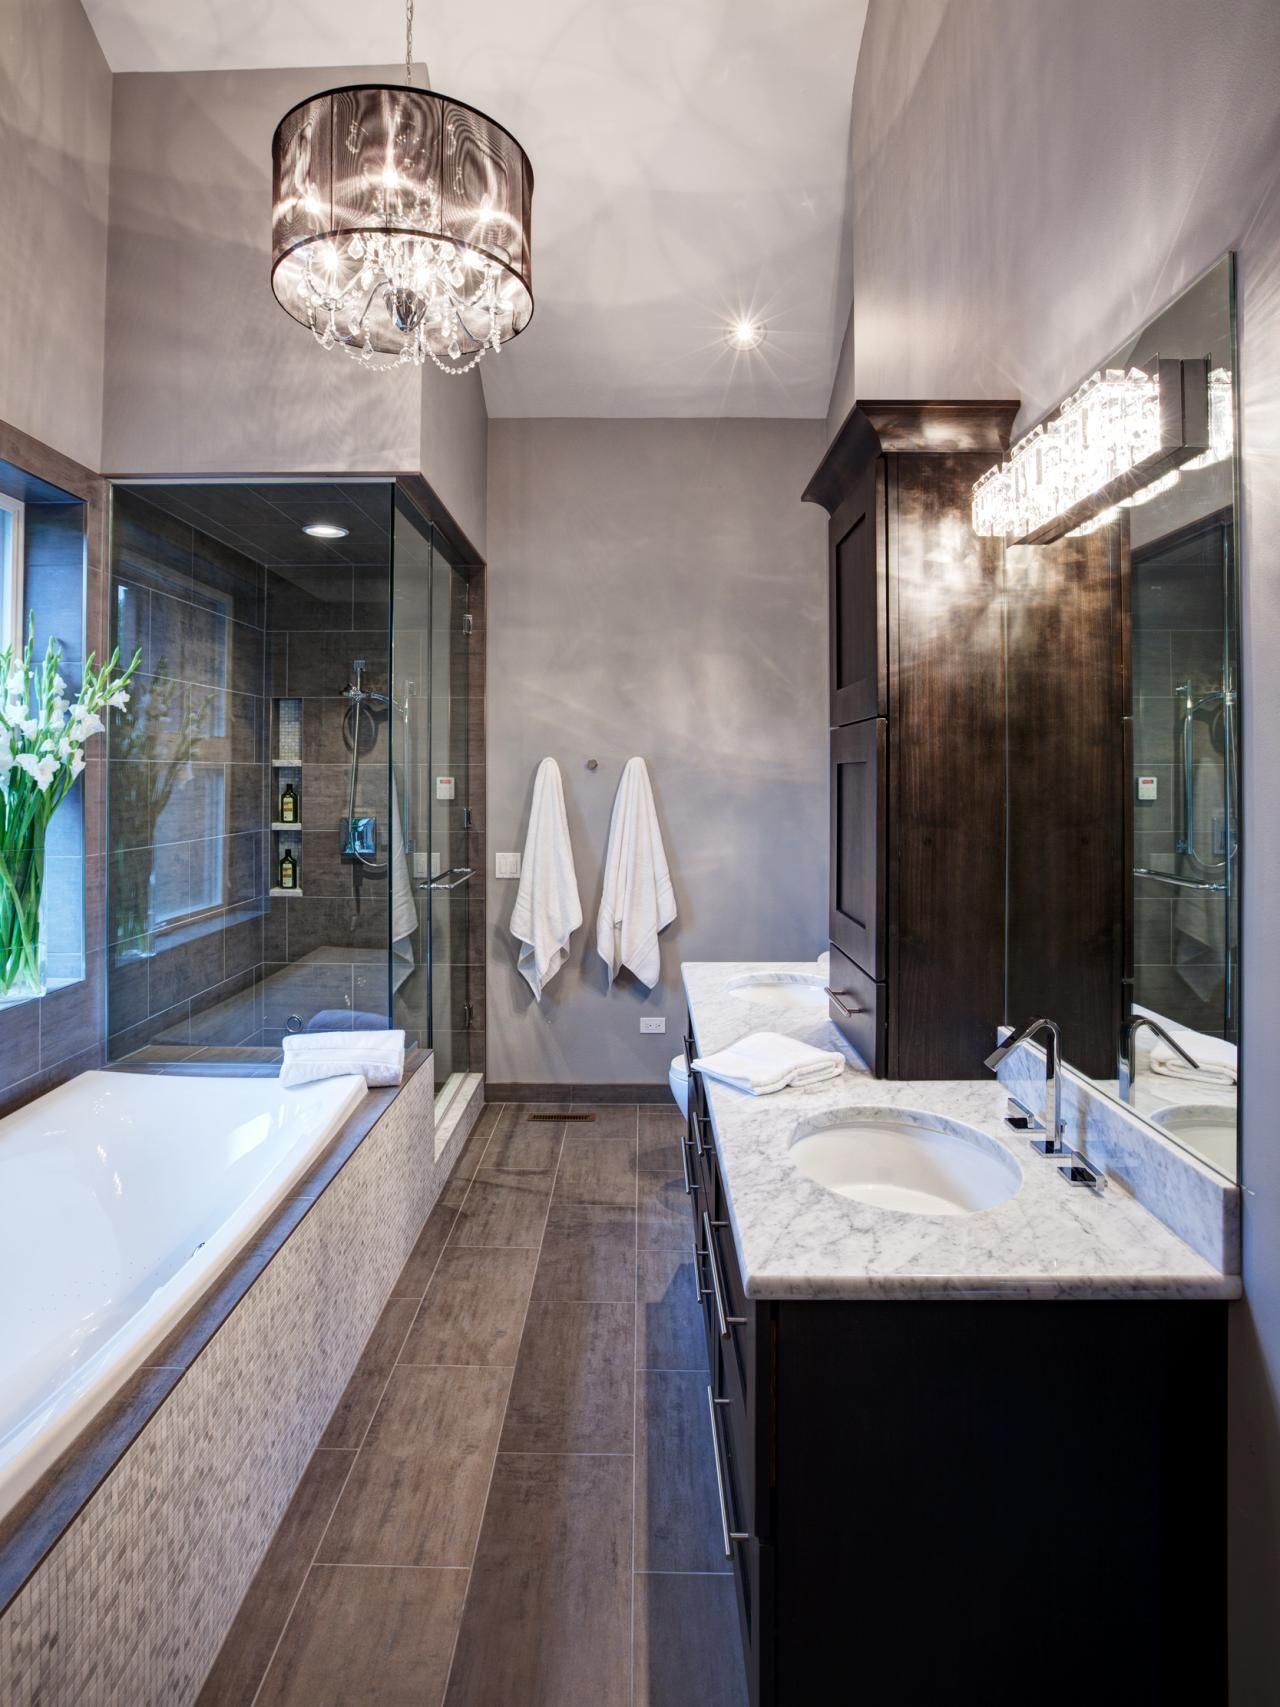 Modern Bathroom Design Ideas Pictures Tips From Hgtv Stylish Bathroom Bathroom Remodel Master Sophisticated Bathroom